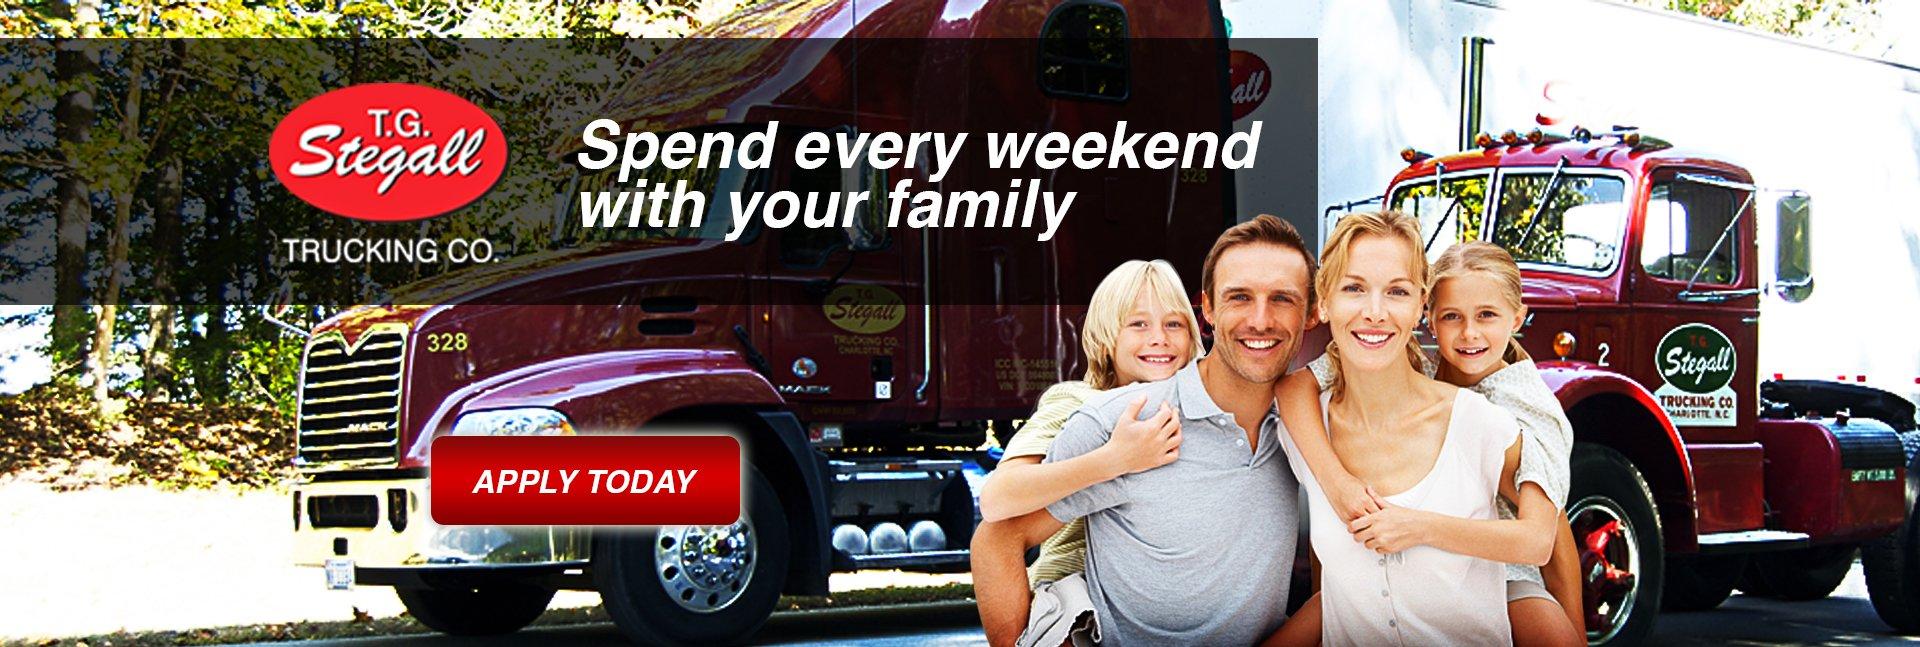 trucking job, trucking companies hiring drivers, CDL driver jobs, Charlotte NC